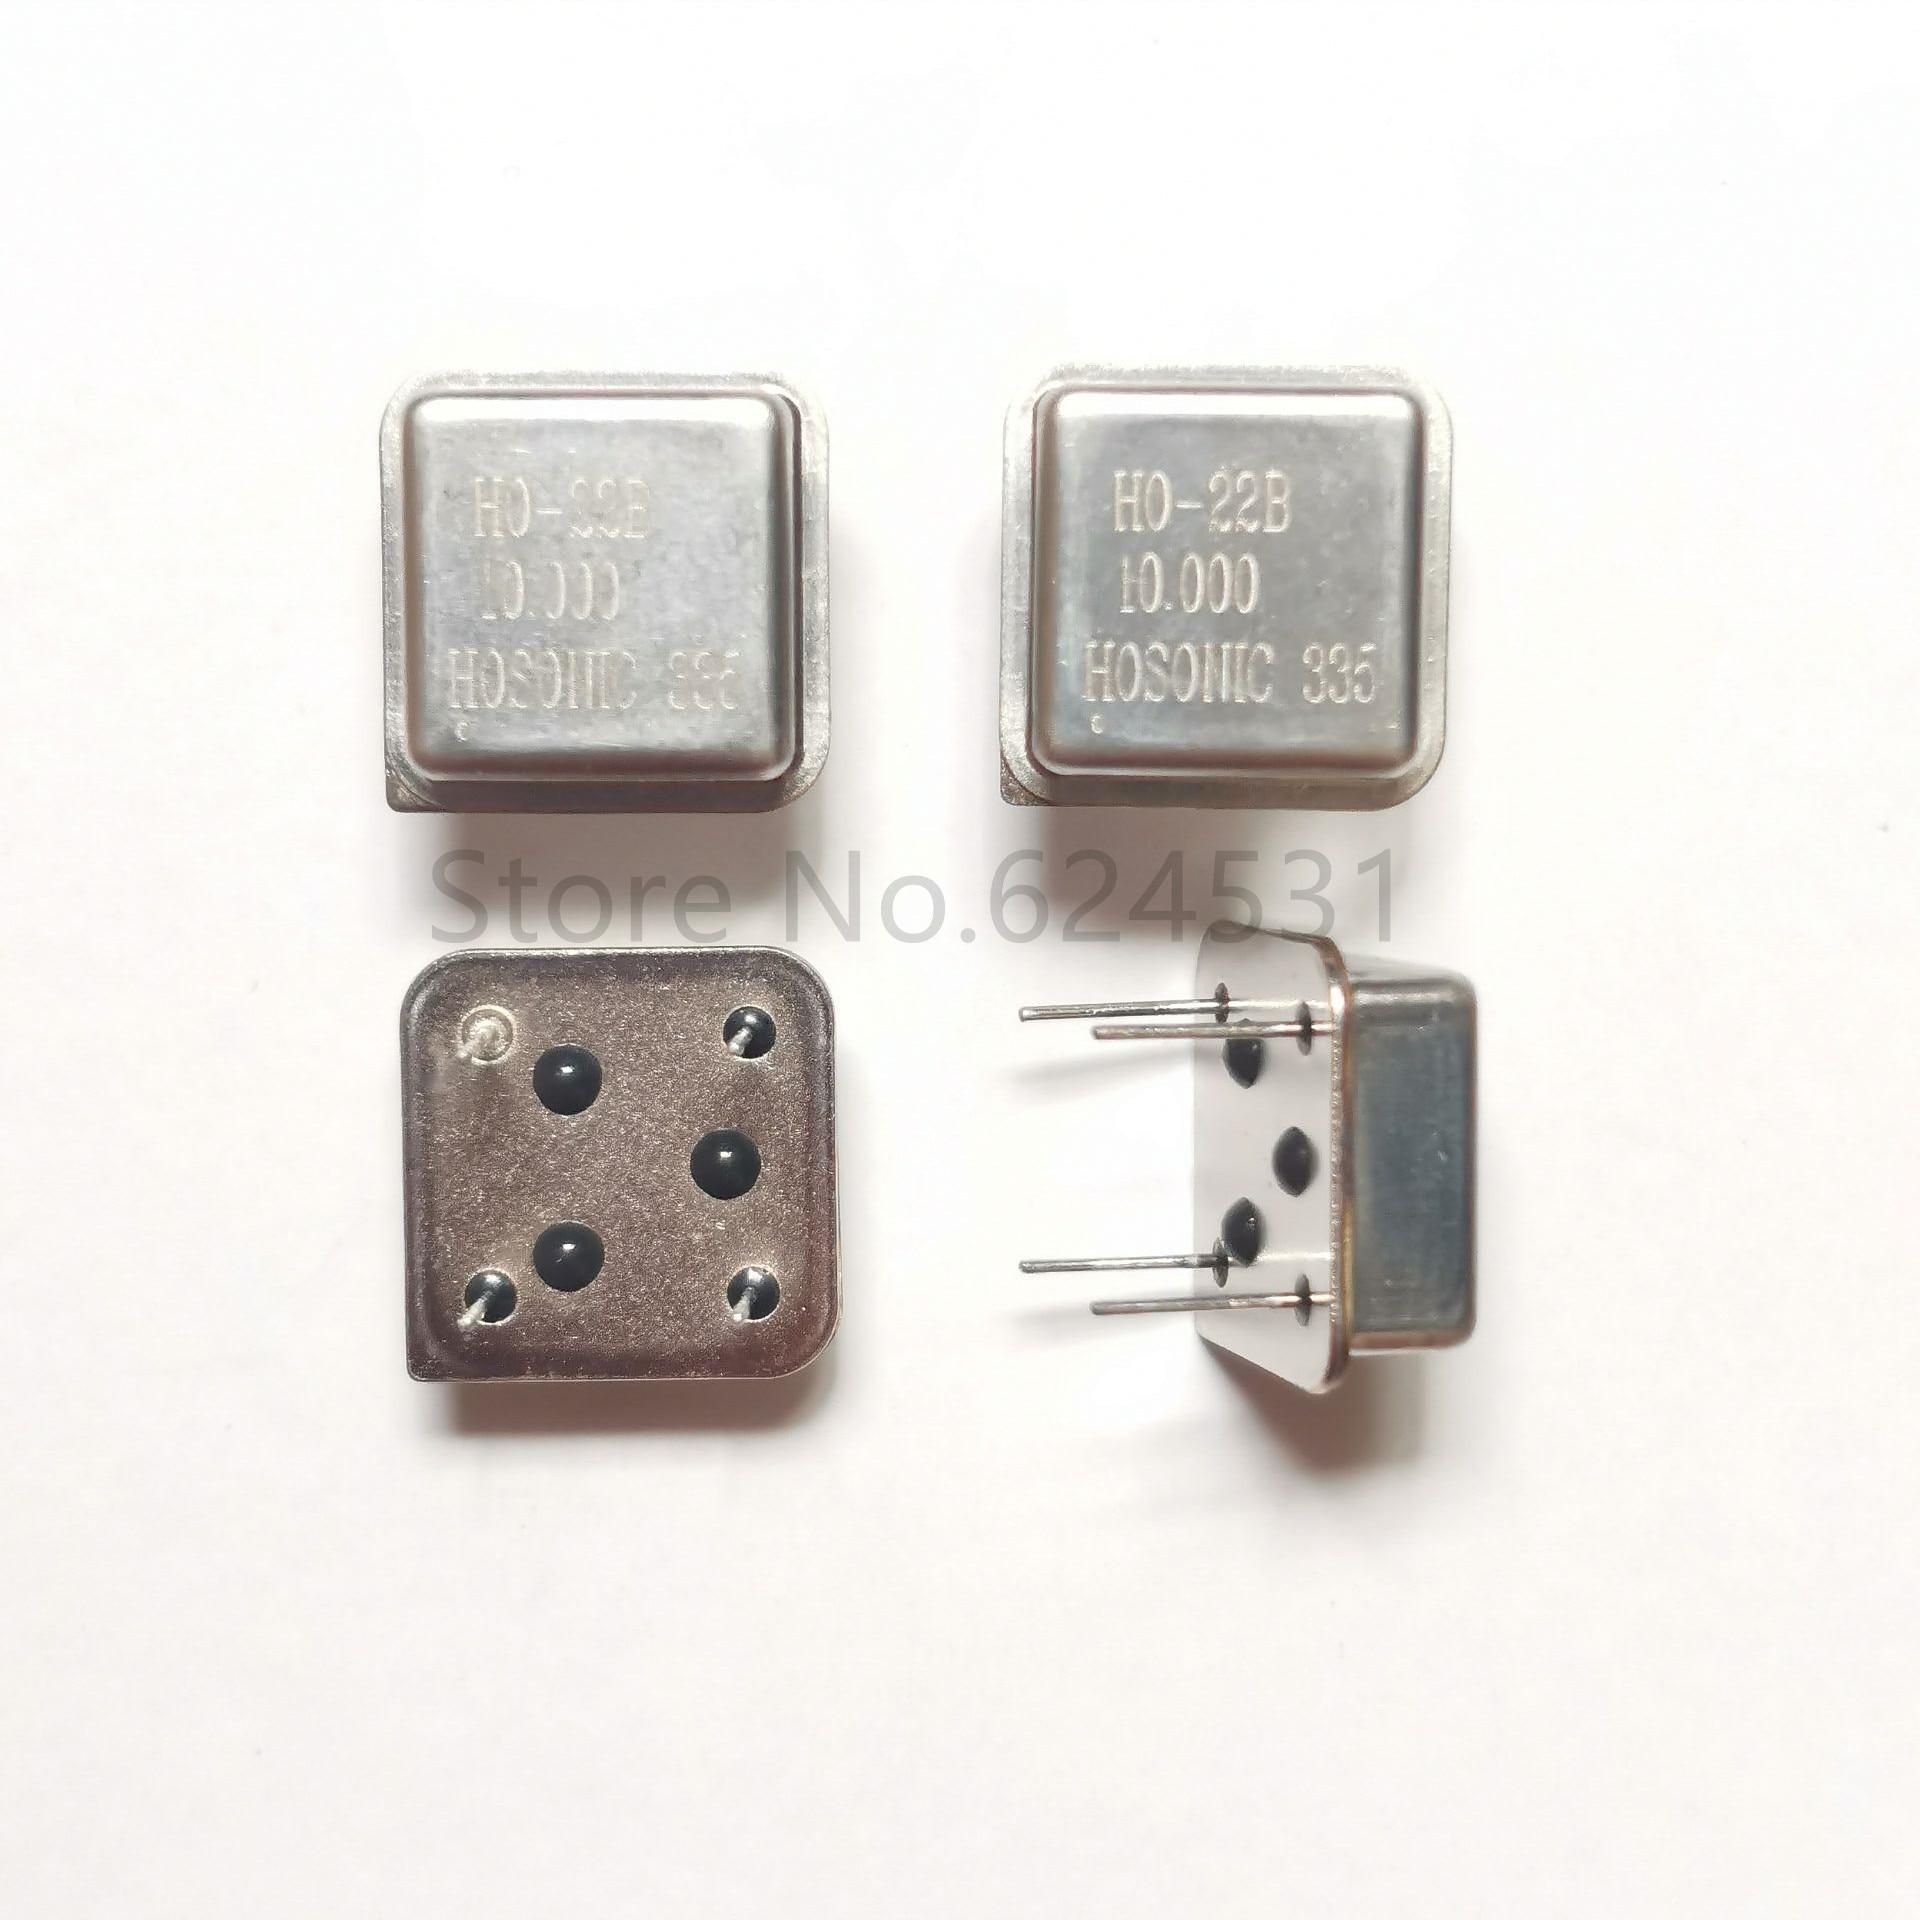 10pcs In-line Active Crystal Oscillator Clock Square Half Size DIP-4 OSC 10MHZ 10.000MHZ 10M